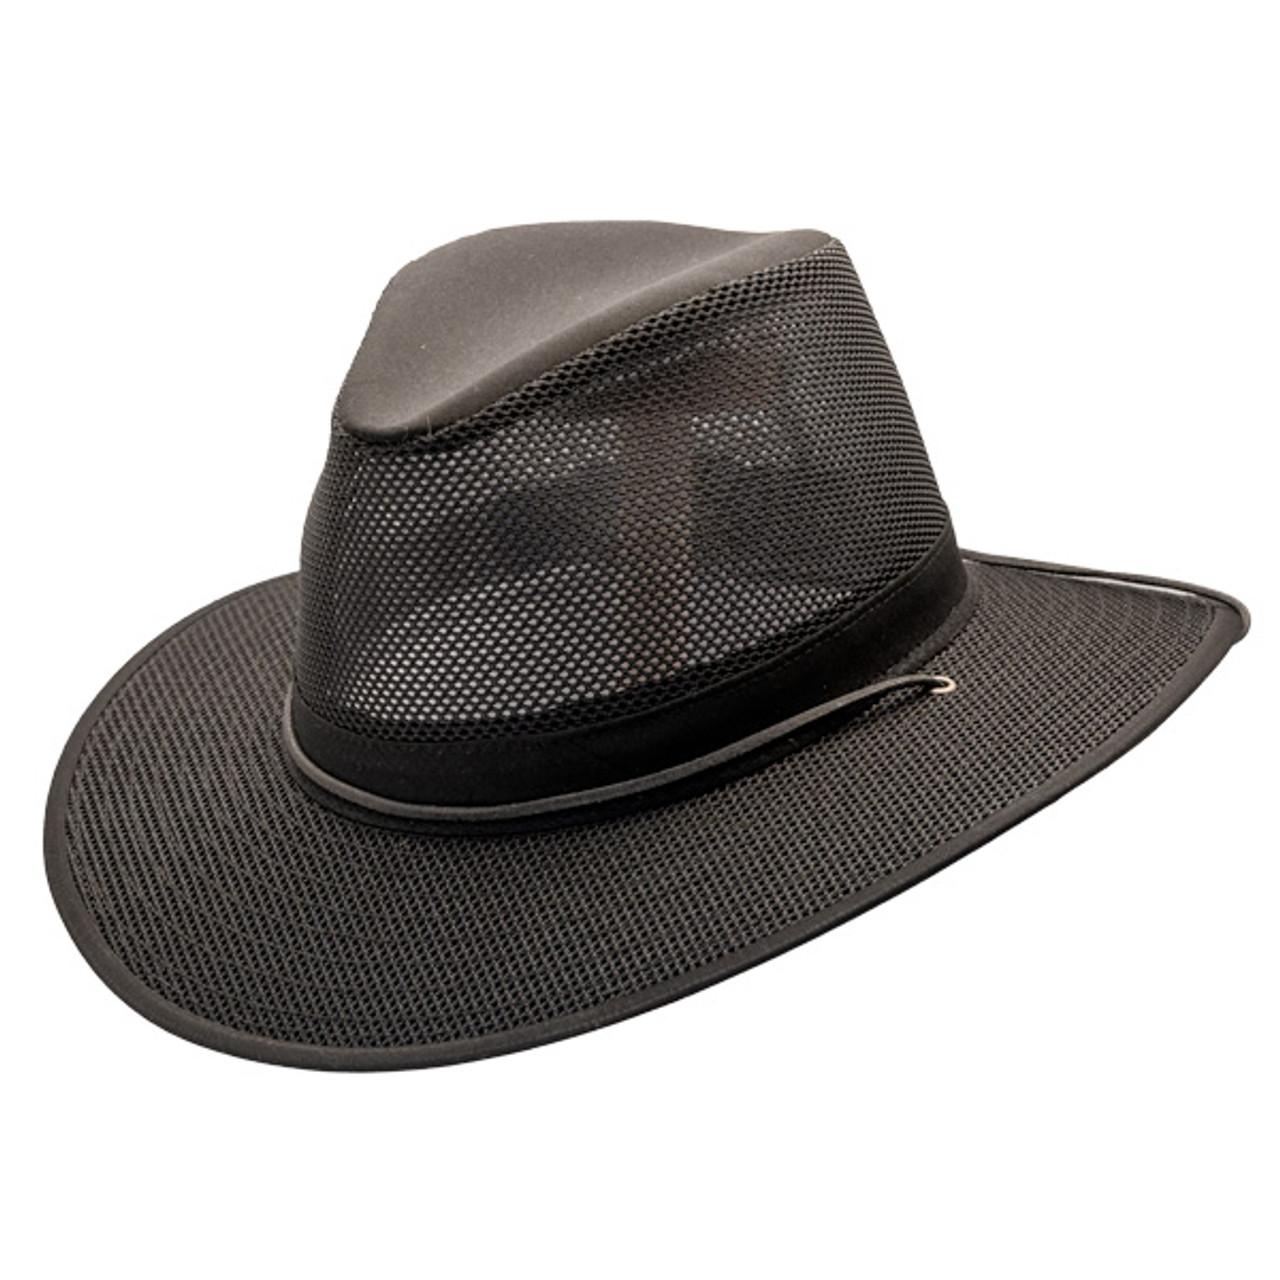 0ae6504b2 Henschel - Aussie Packable Breezer® Safari Sun Hat